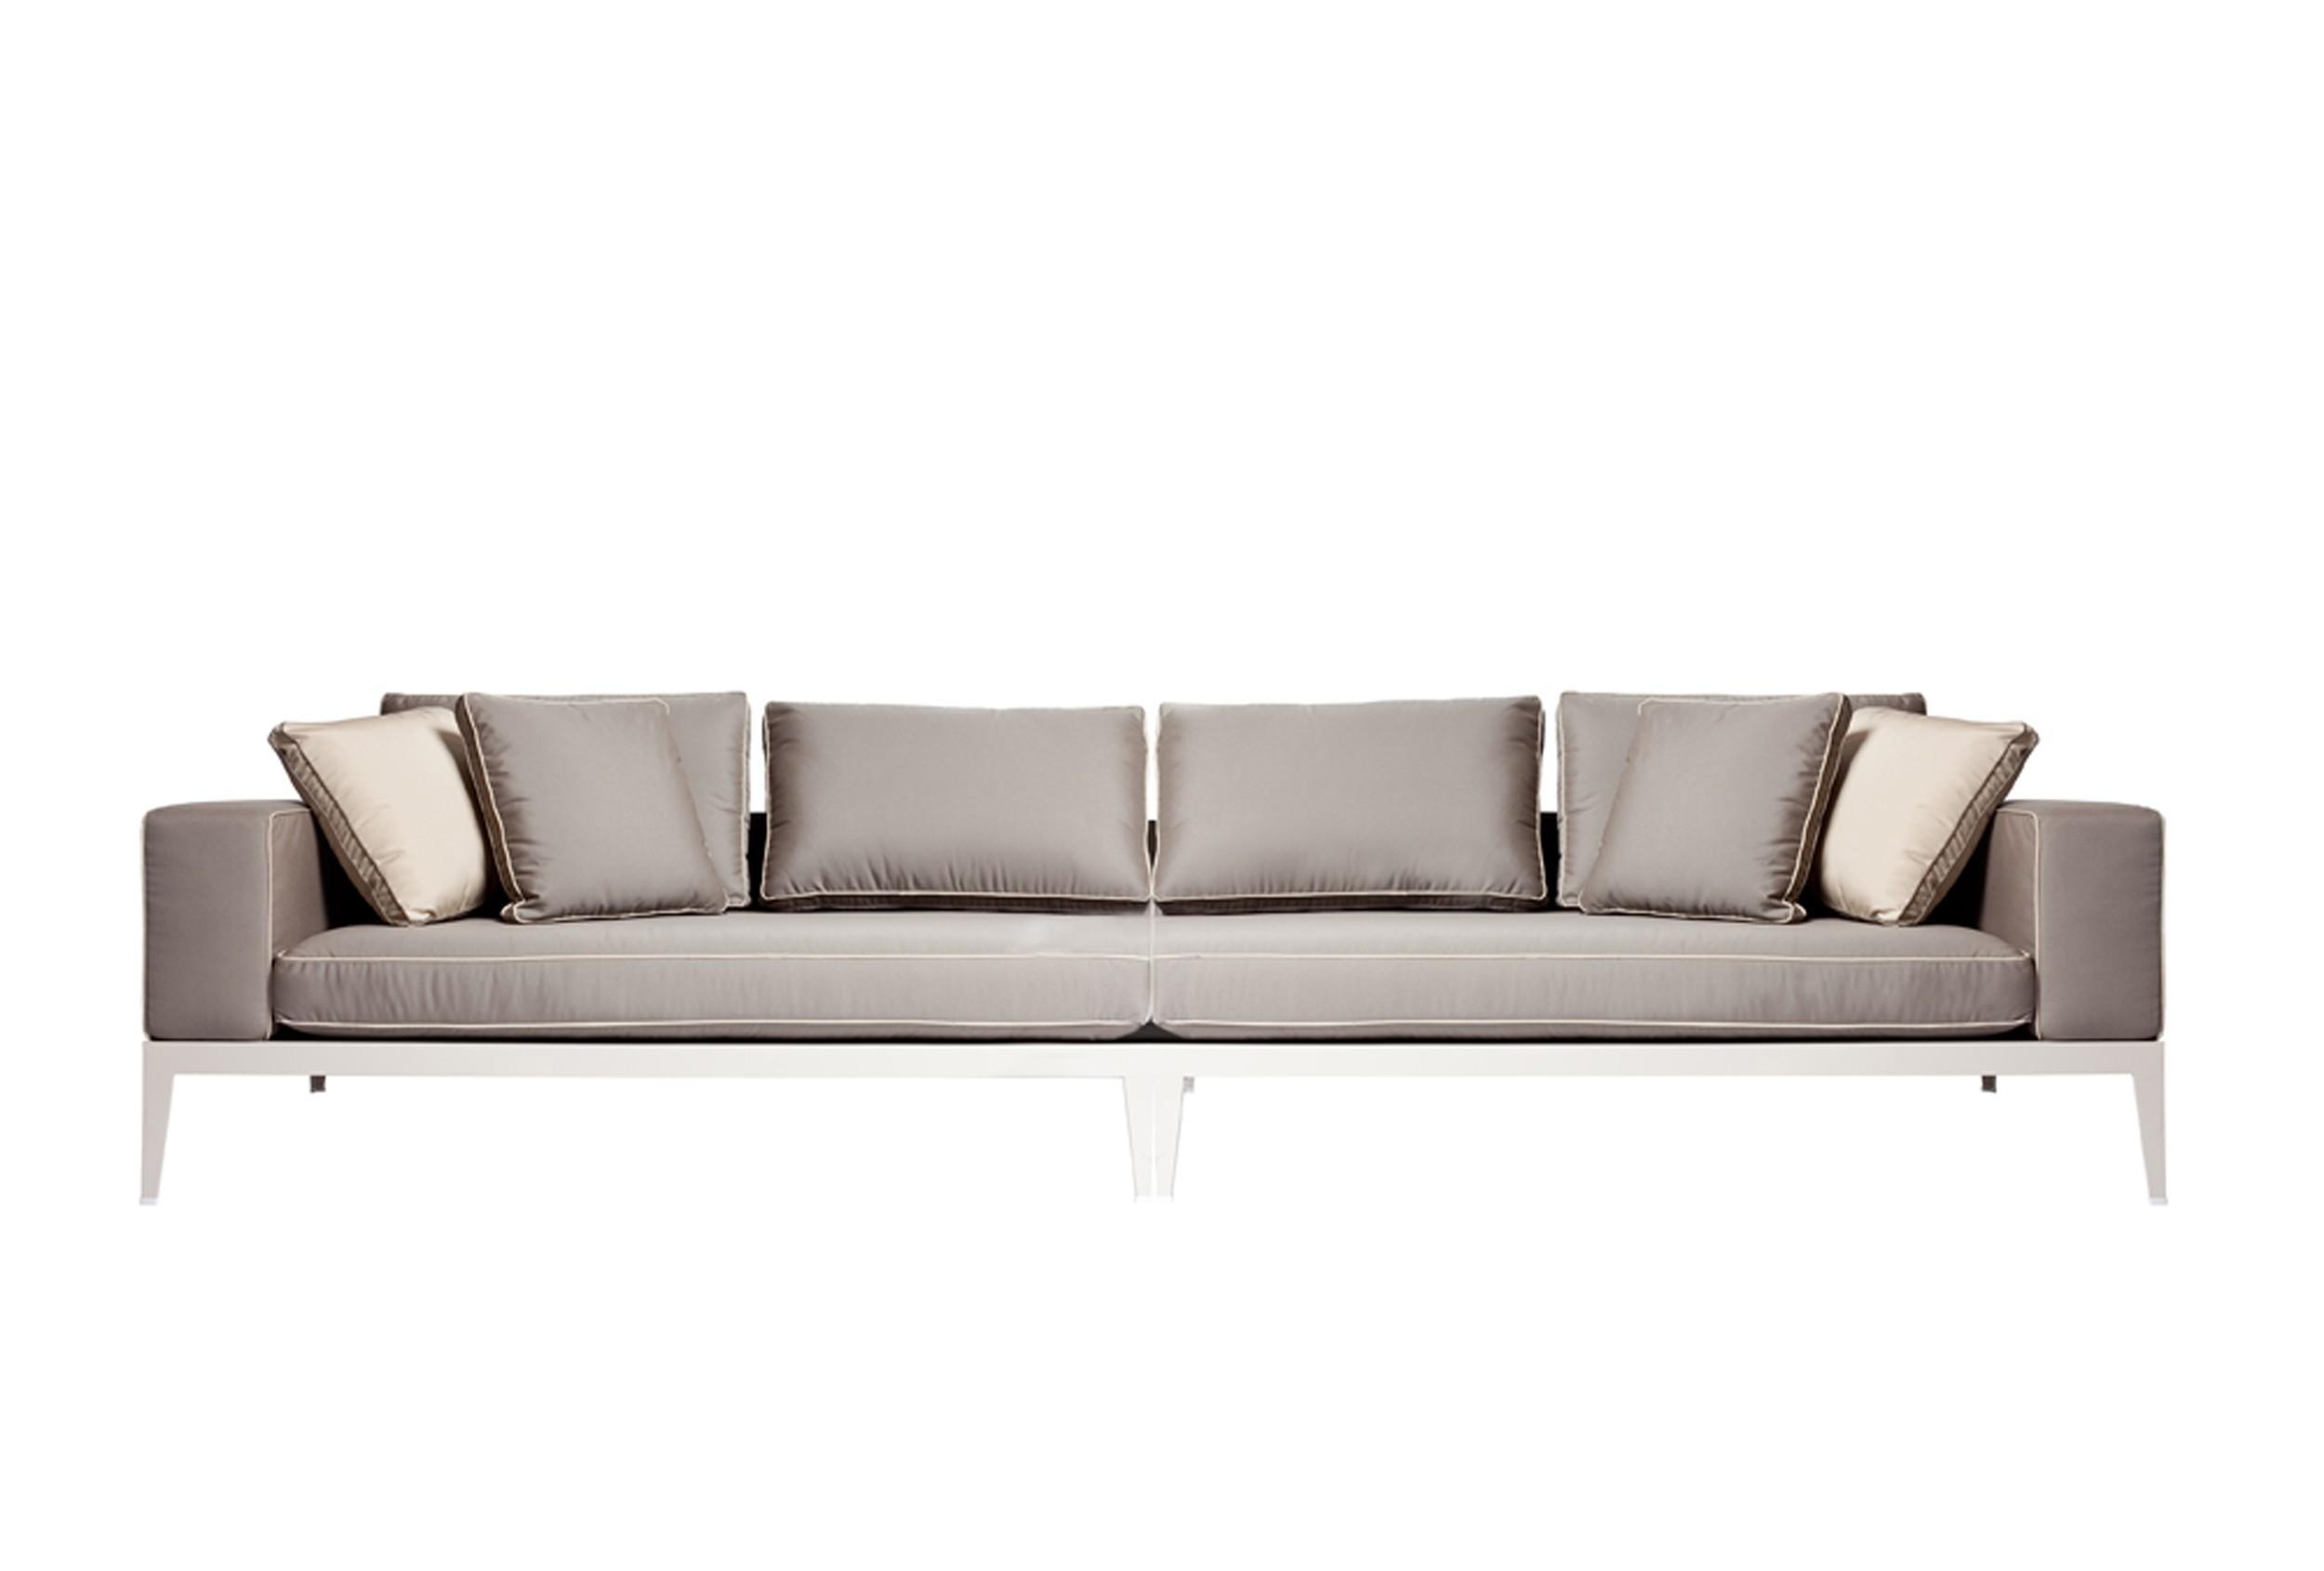 Balmoral 4 Seater Sofa | Viesso Regarding 4 Seater Sofas (View 7 of 20)